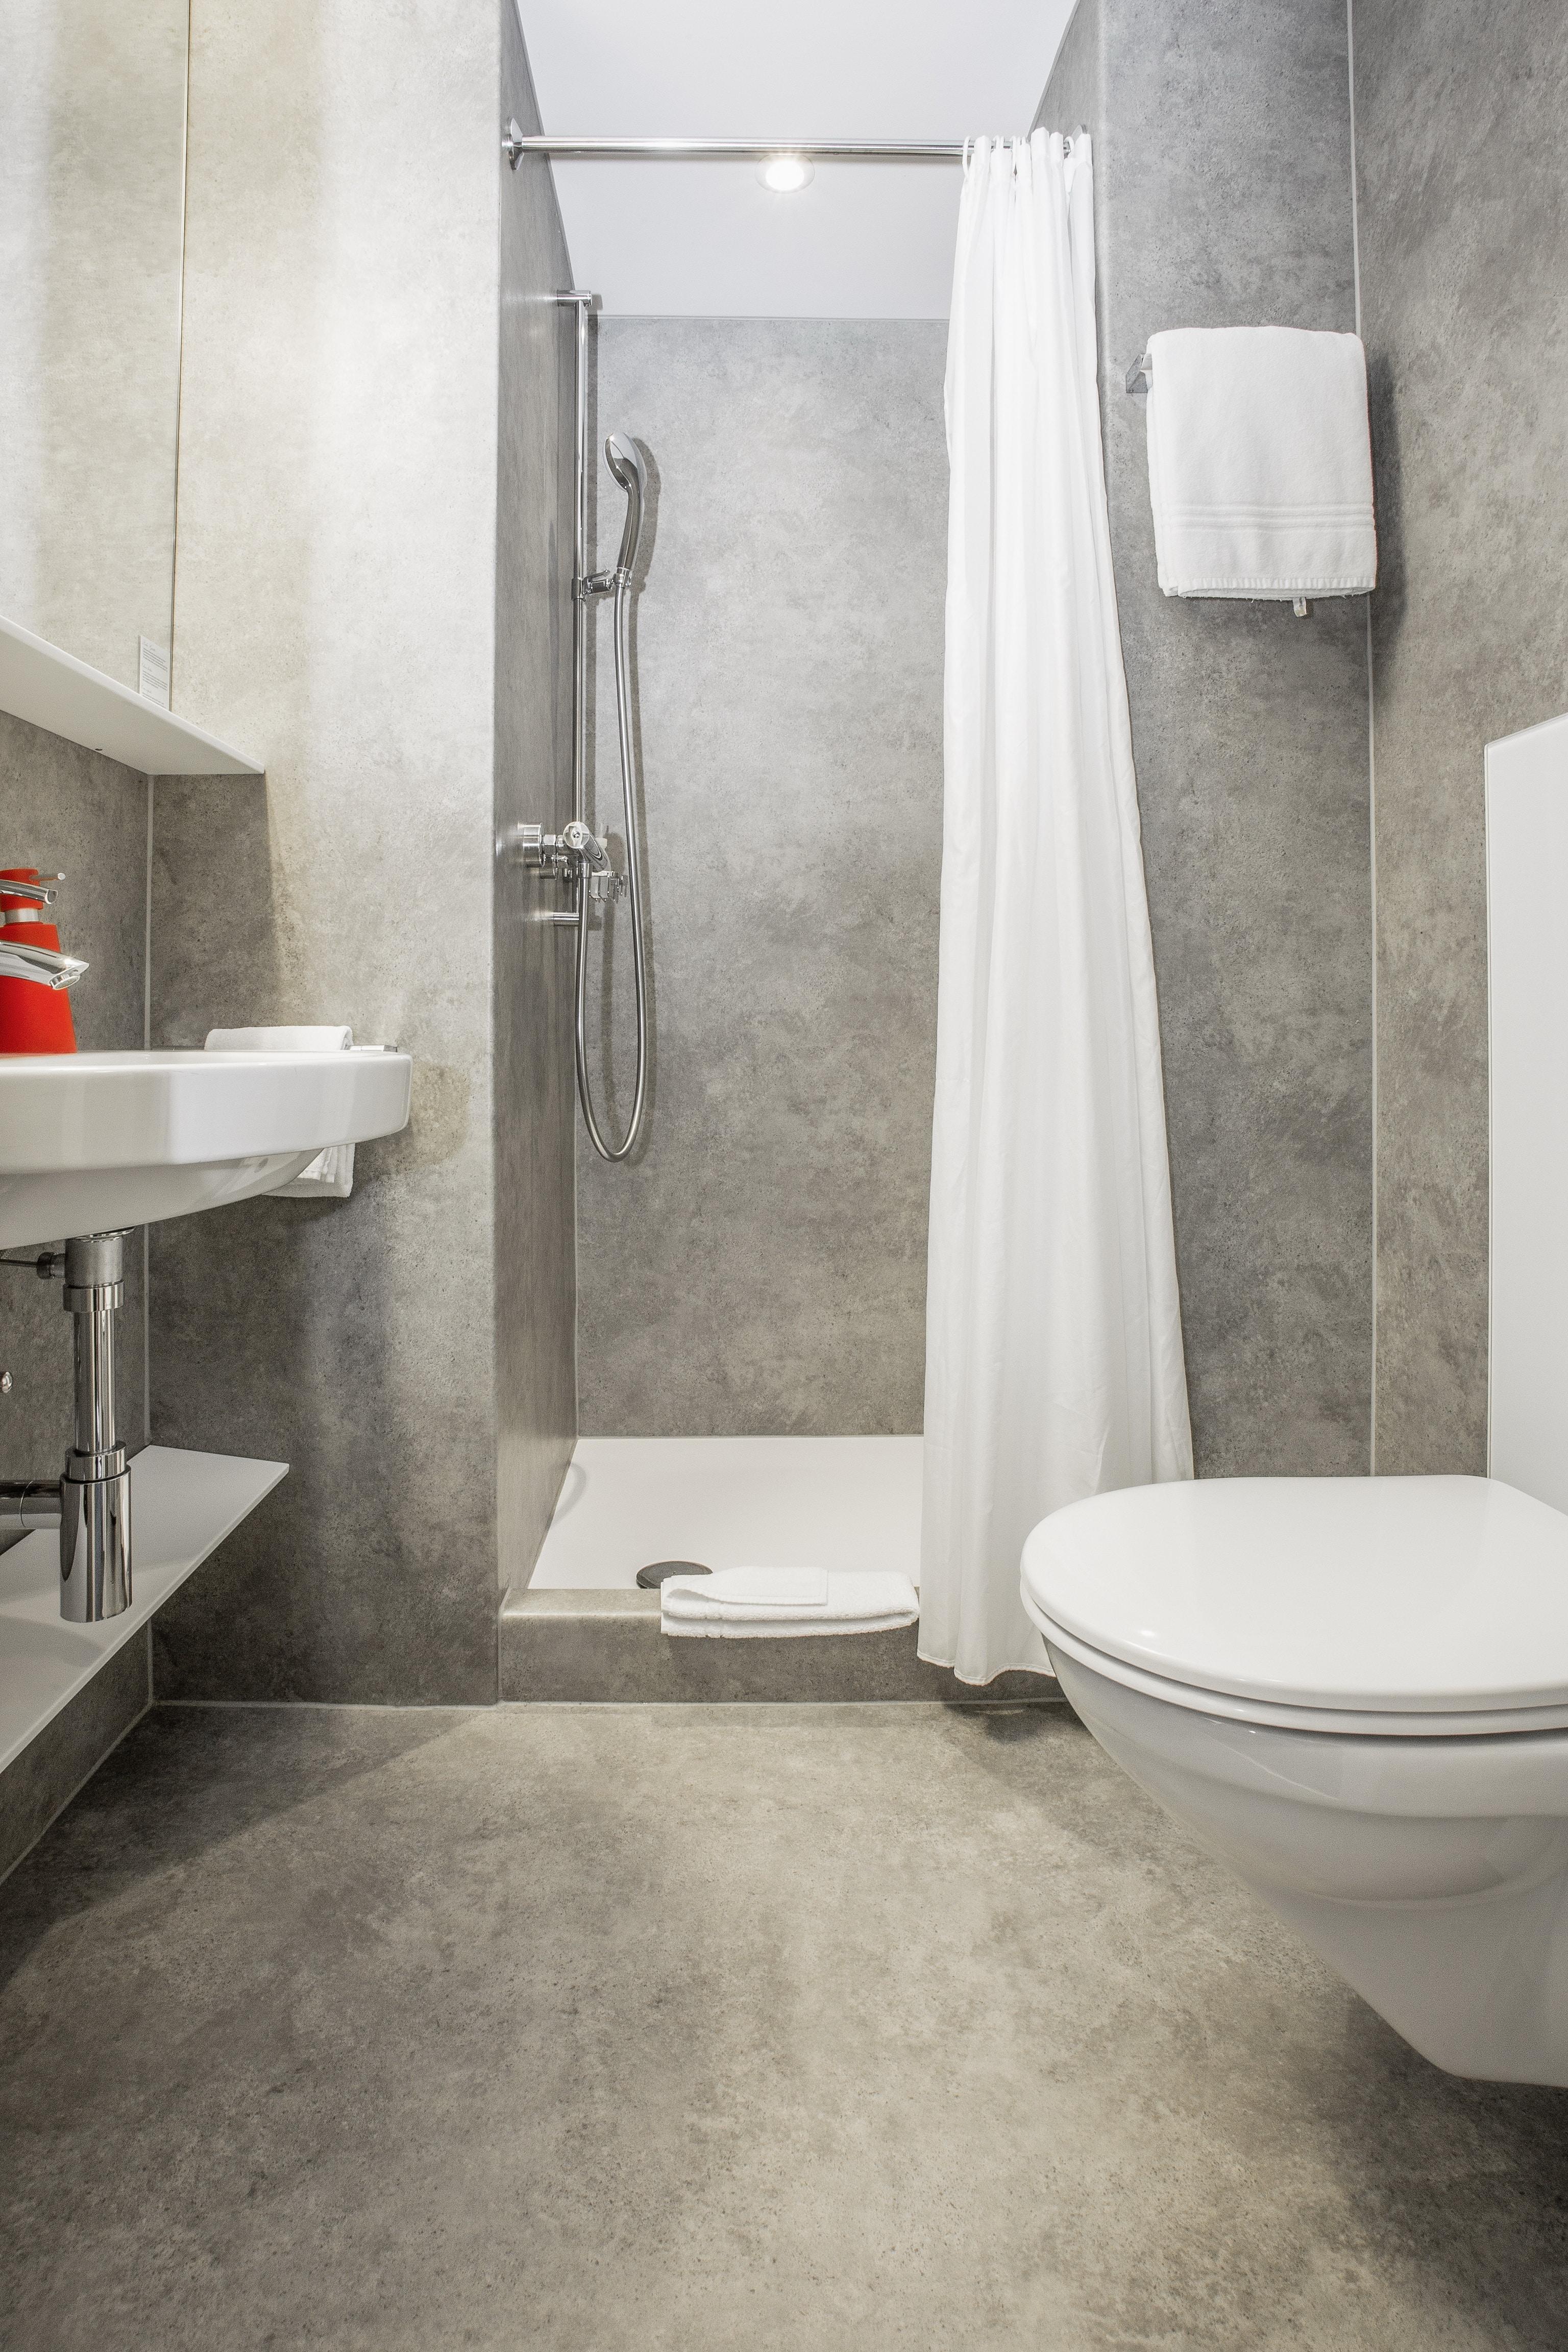 Salle de bain, douche/WC